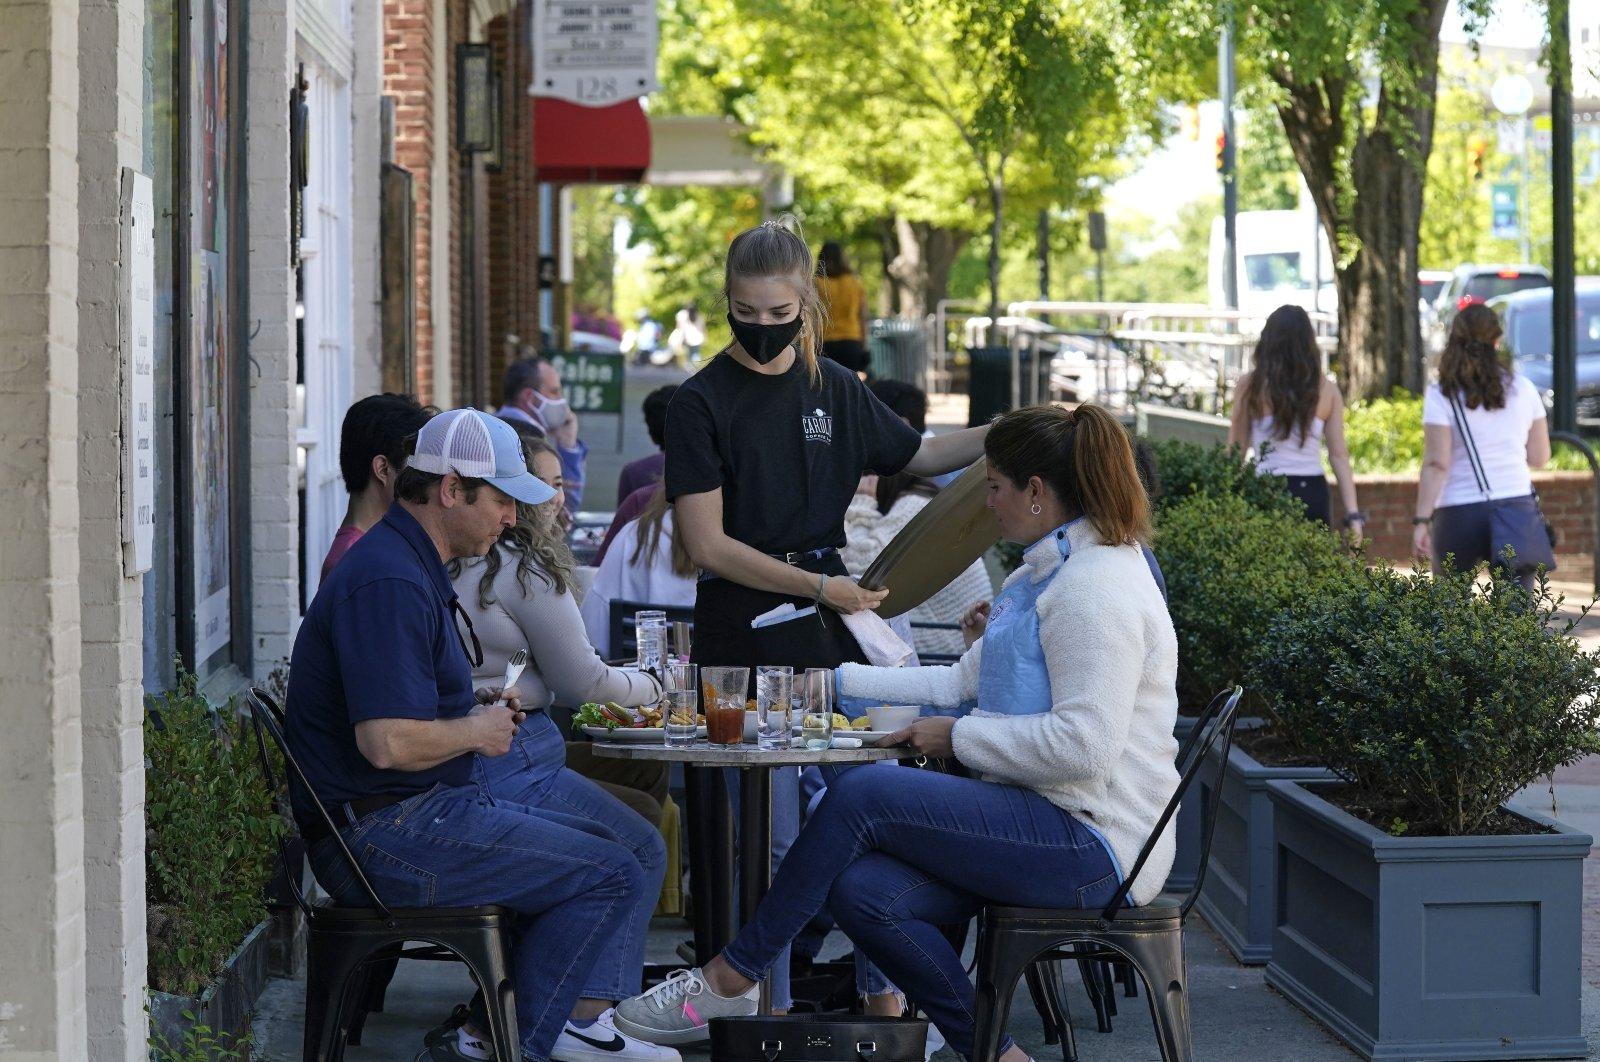 People dine along a sidewalk on Franklin Street in Chapel Hill, North Carolina, U.S., April 16, 2021. (AP Photo)